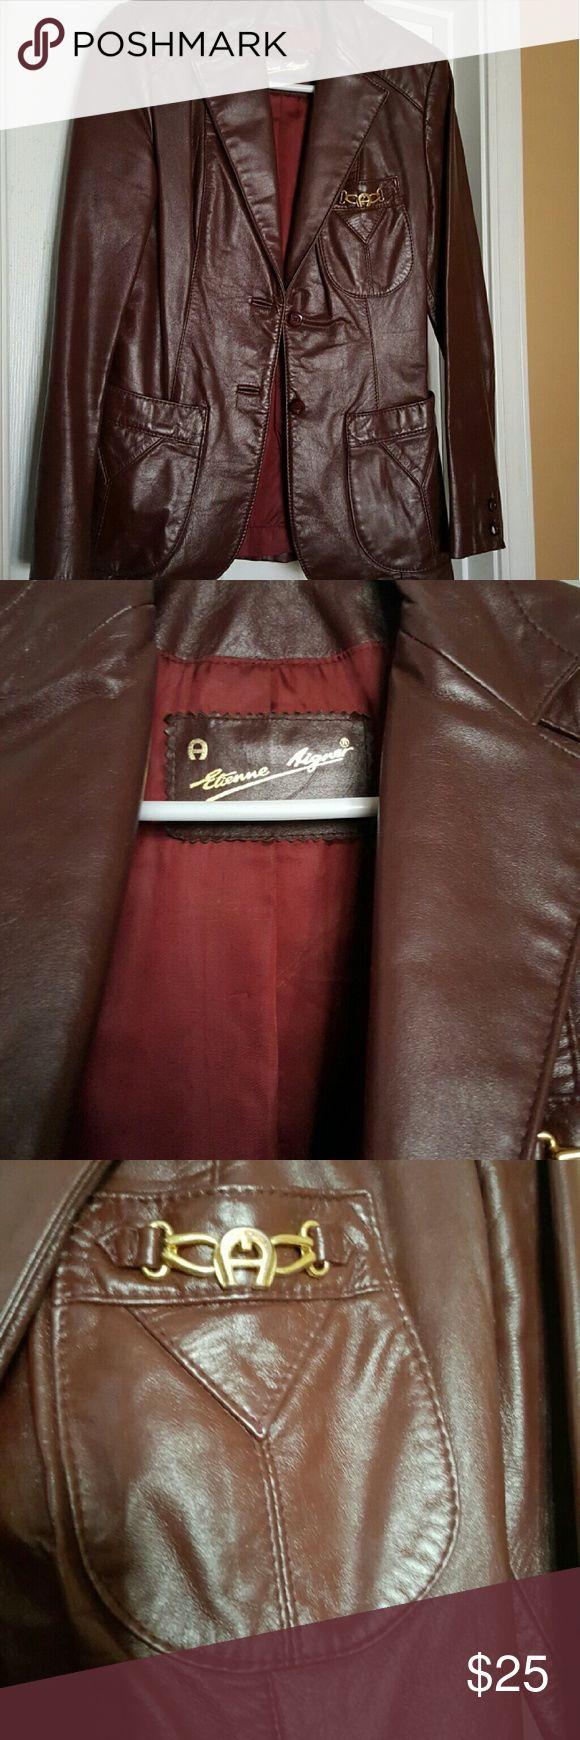 Etienne aigner black leather gloves - Etienne Aigner Vintage Etienne Aigner Leather Blazer Good Condition More Pics Upon Request Etienne Aigner